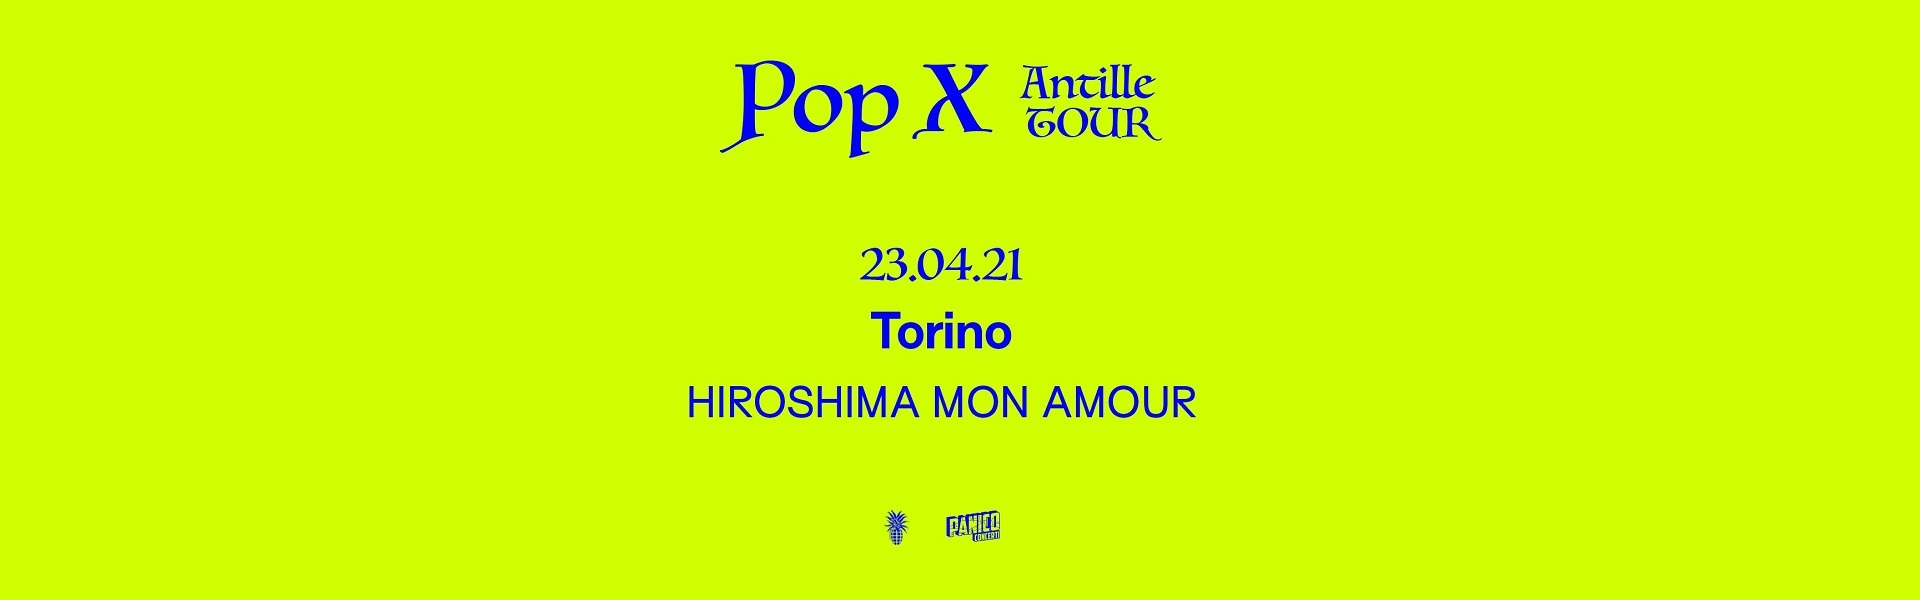 Pop_X_Biglietti_Hiroshima_Mon_Amour_Torino_23_04_2021